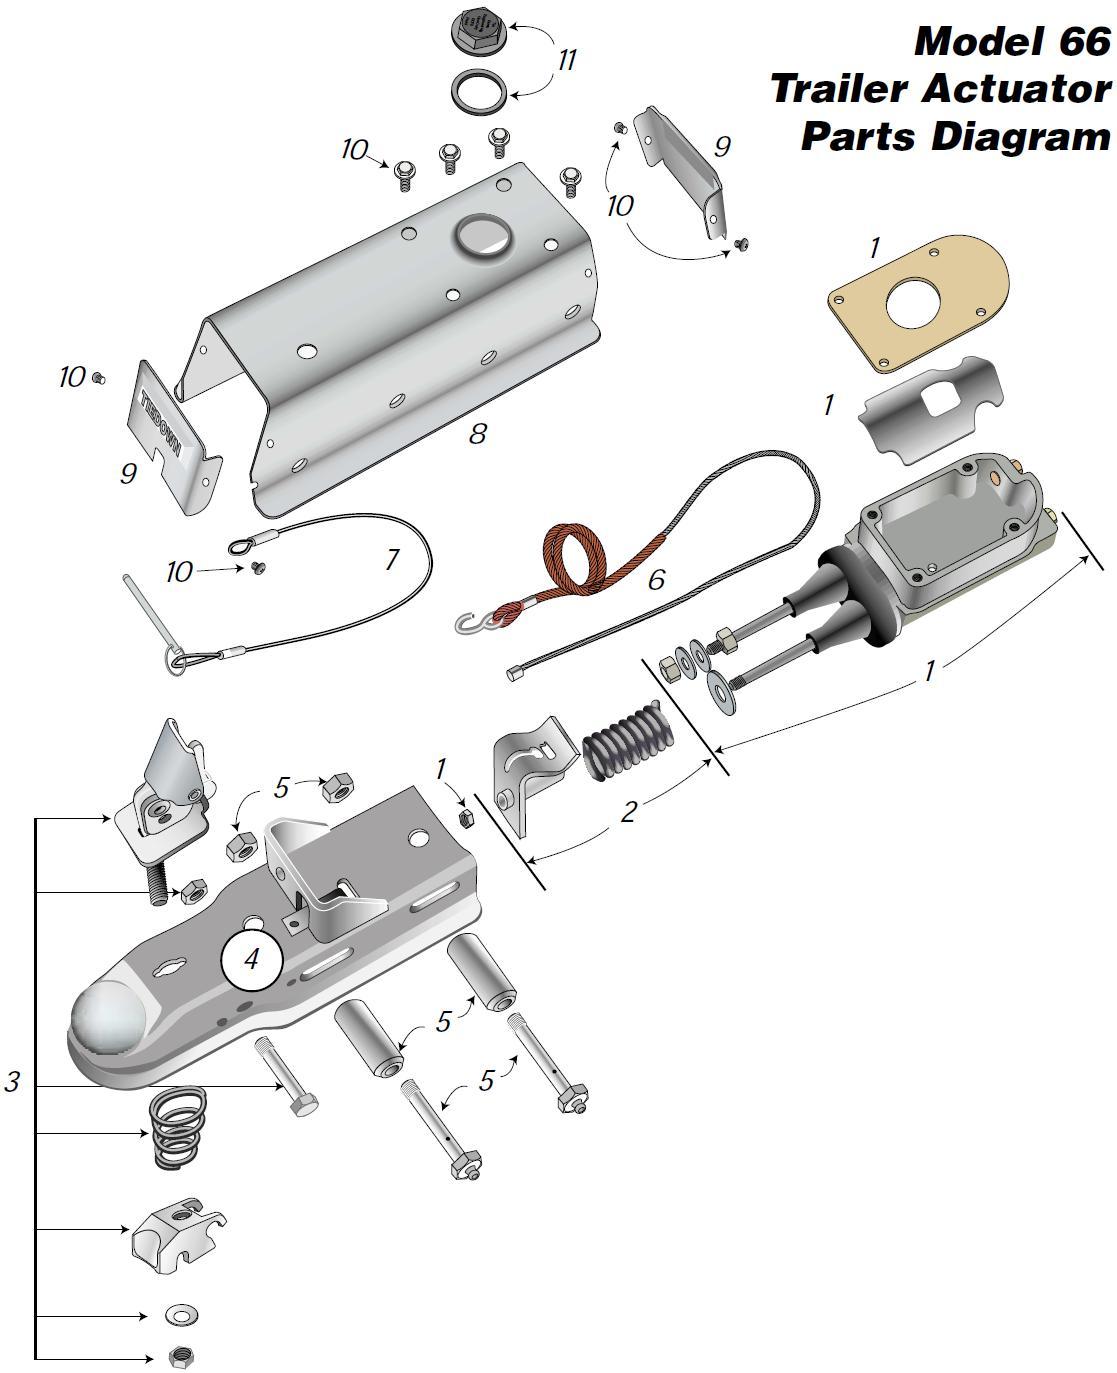 Tie Down Actuator Wiring Diagram 2014 Harley Touring Wiring Diagram Model For Wiring Diagram Schematics